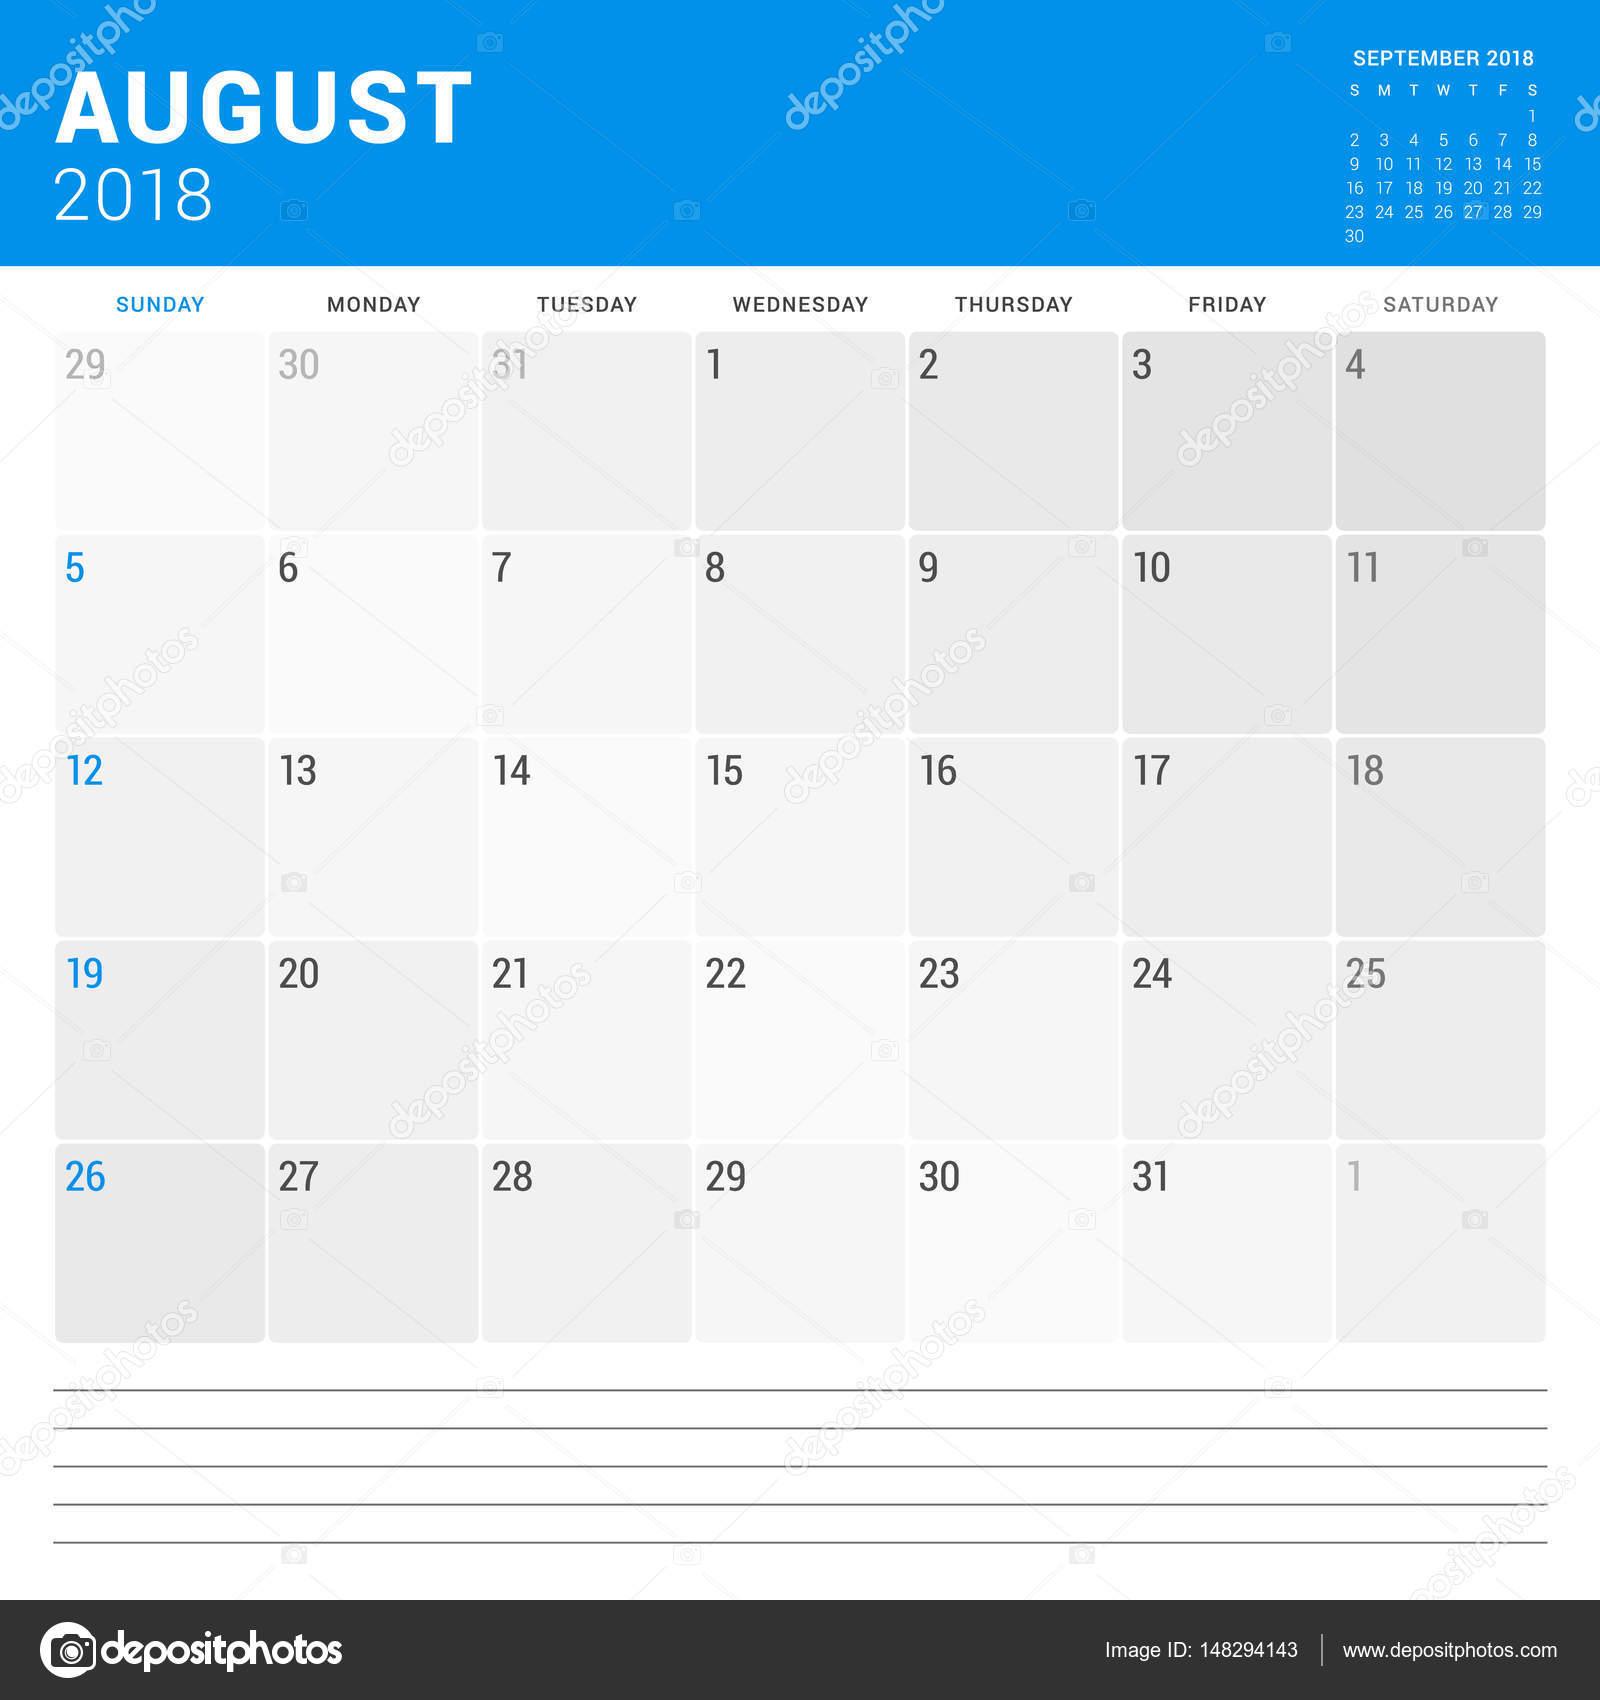 2009 s naptár August 2018. Calendar planner vector design print template. Week  2009 s naptár